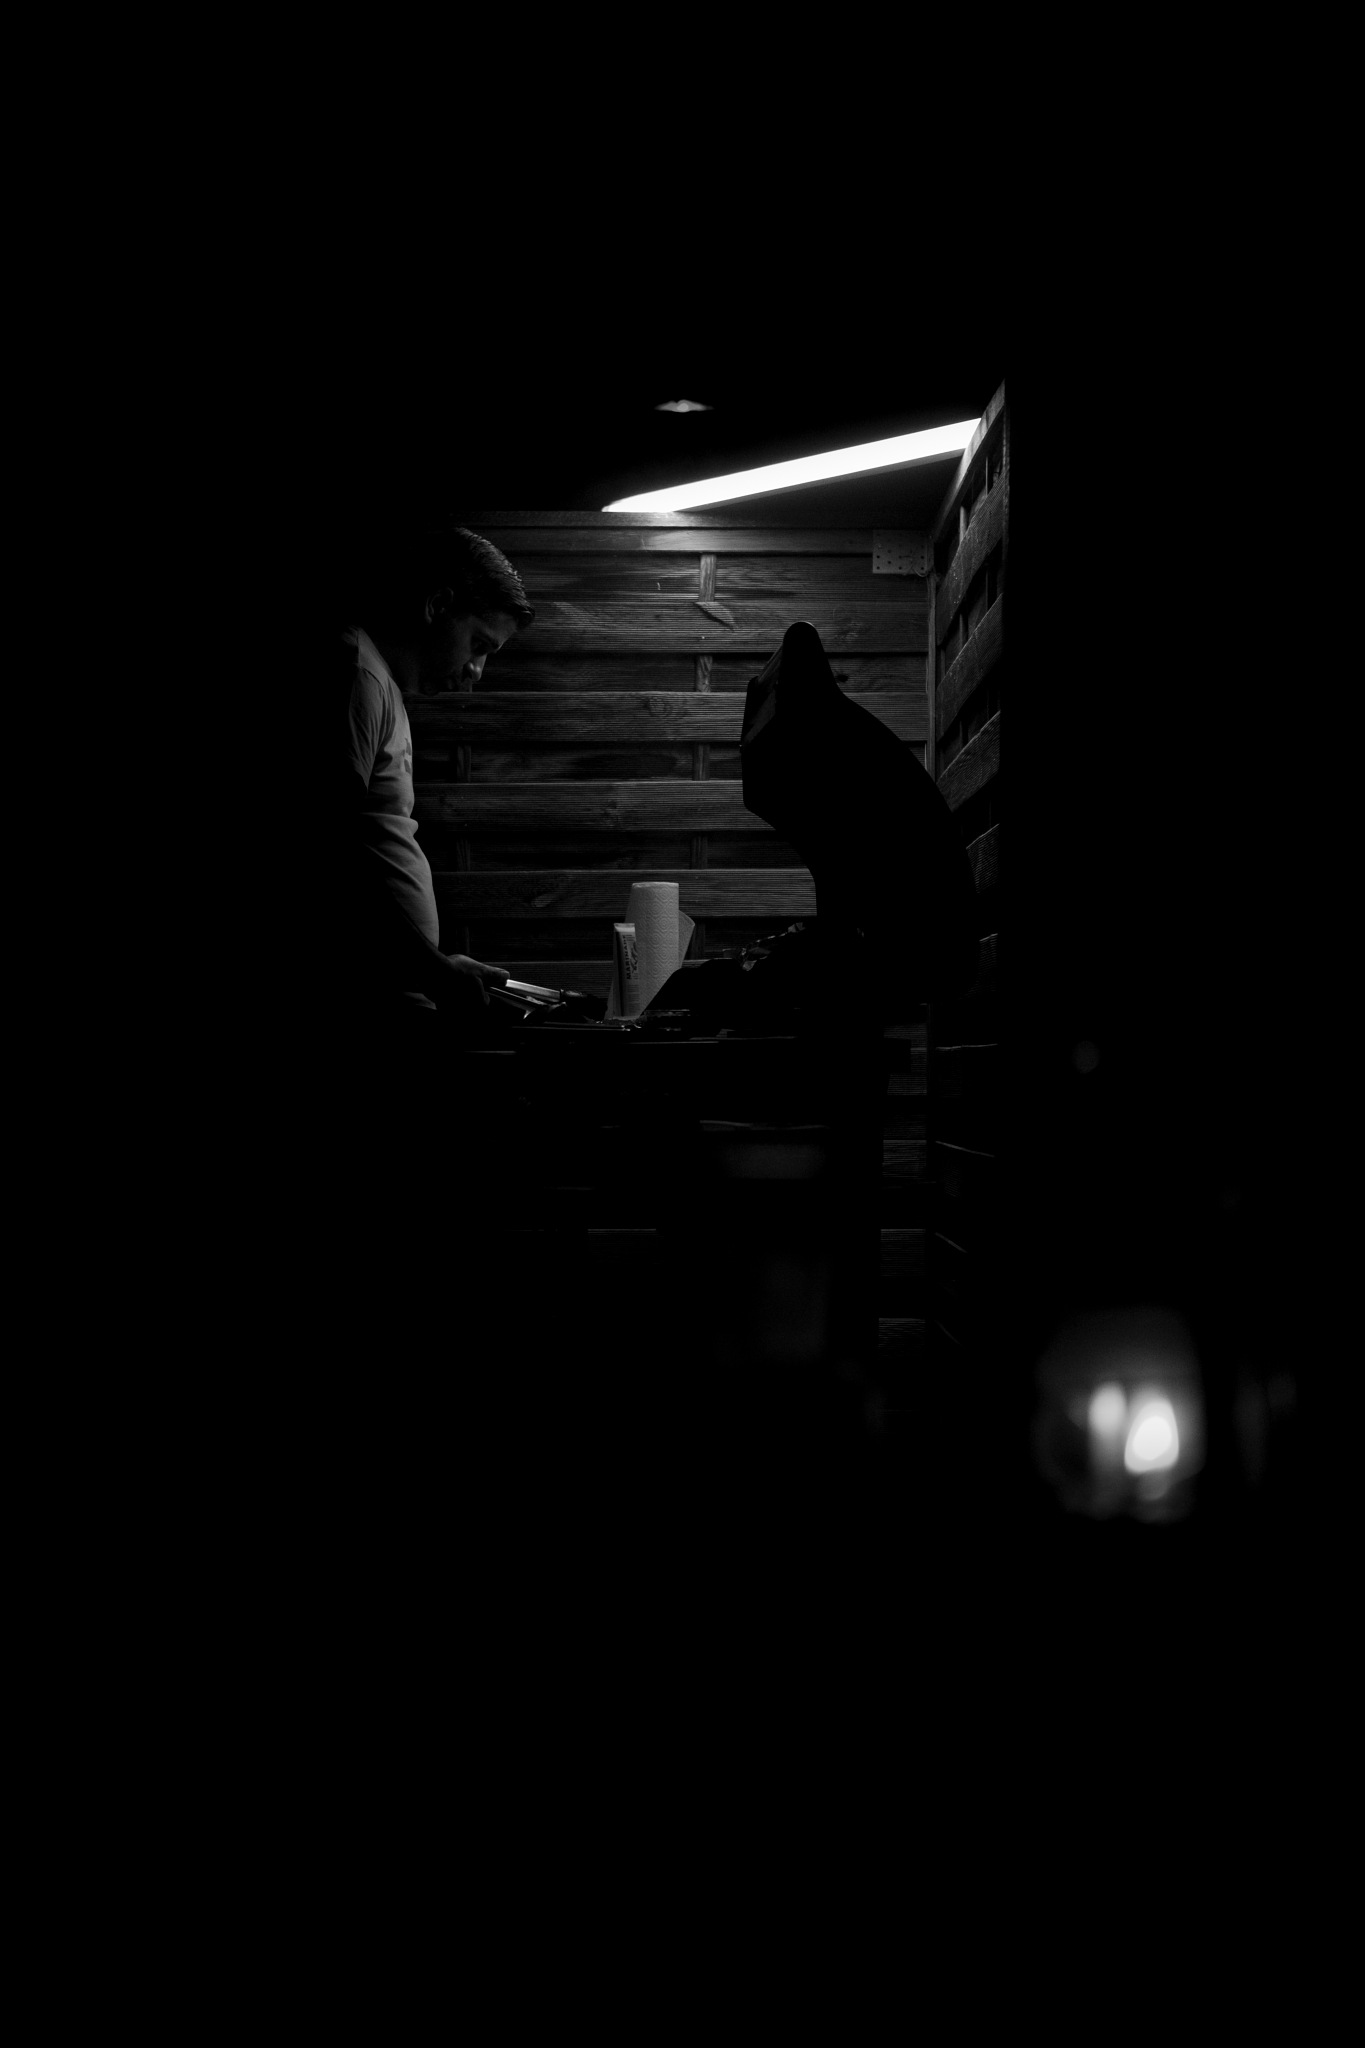 Barbecue by Cris Estalayo